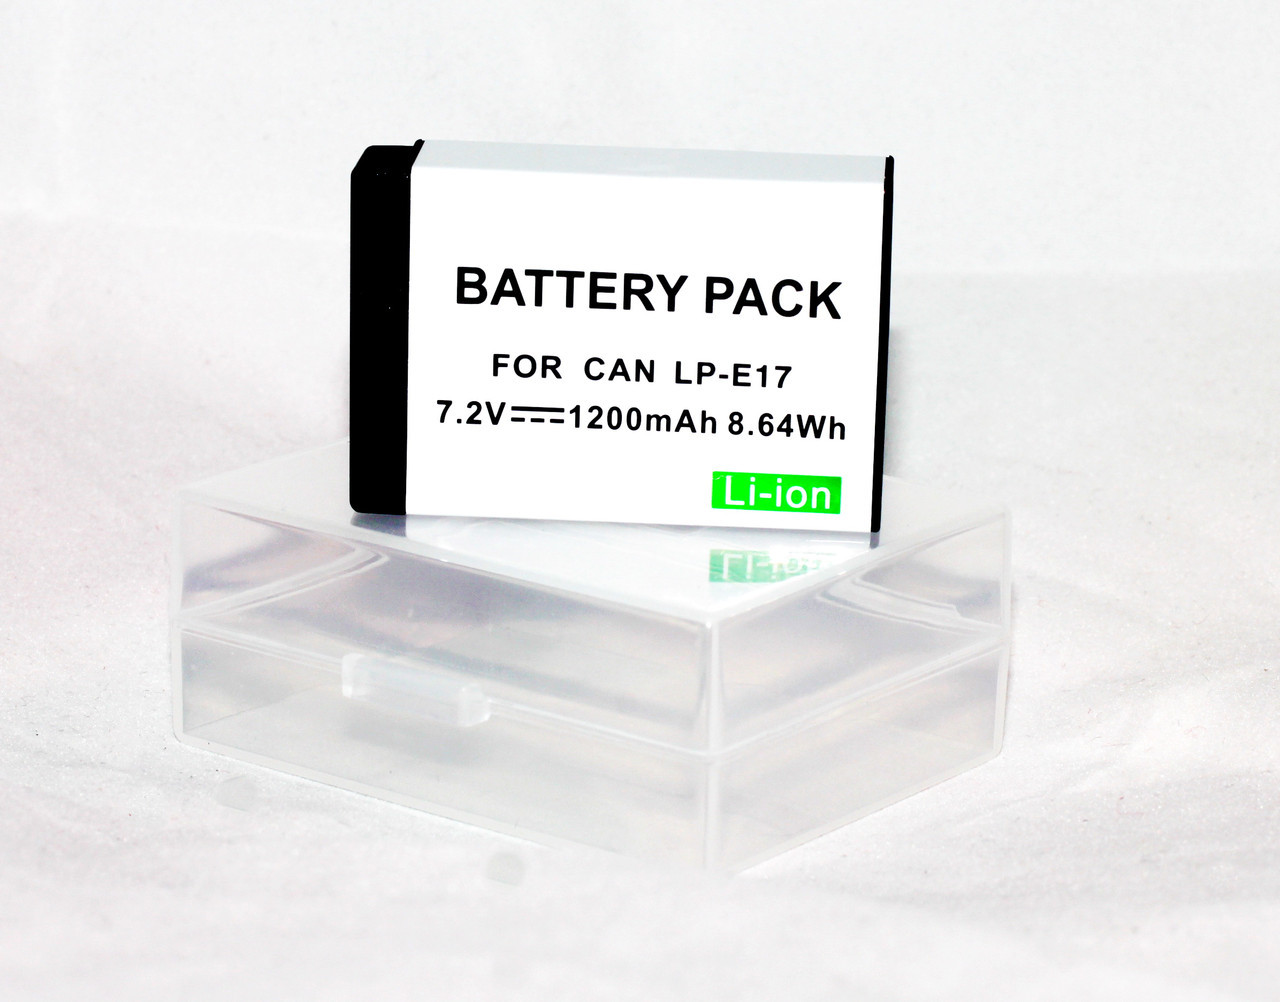 Аккумулятор LP-E17 для фотоаппаратов CANON 77D, 750D, 760D, 800D, 200D, EOS M3, M6 Rebel T6s - аналог 1200 ма